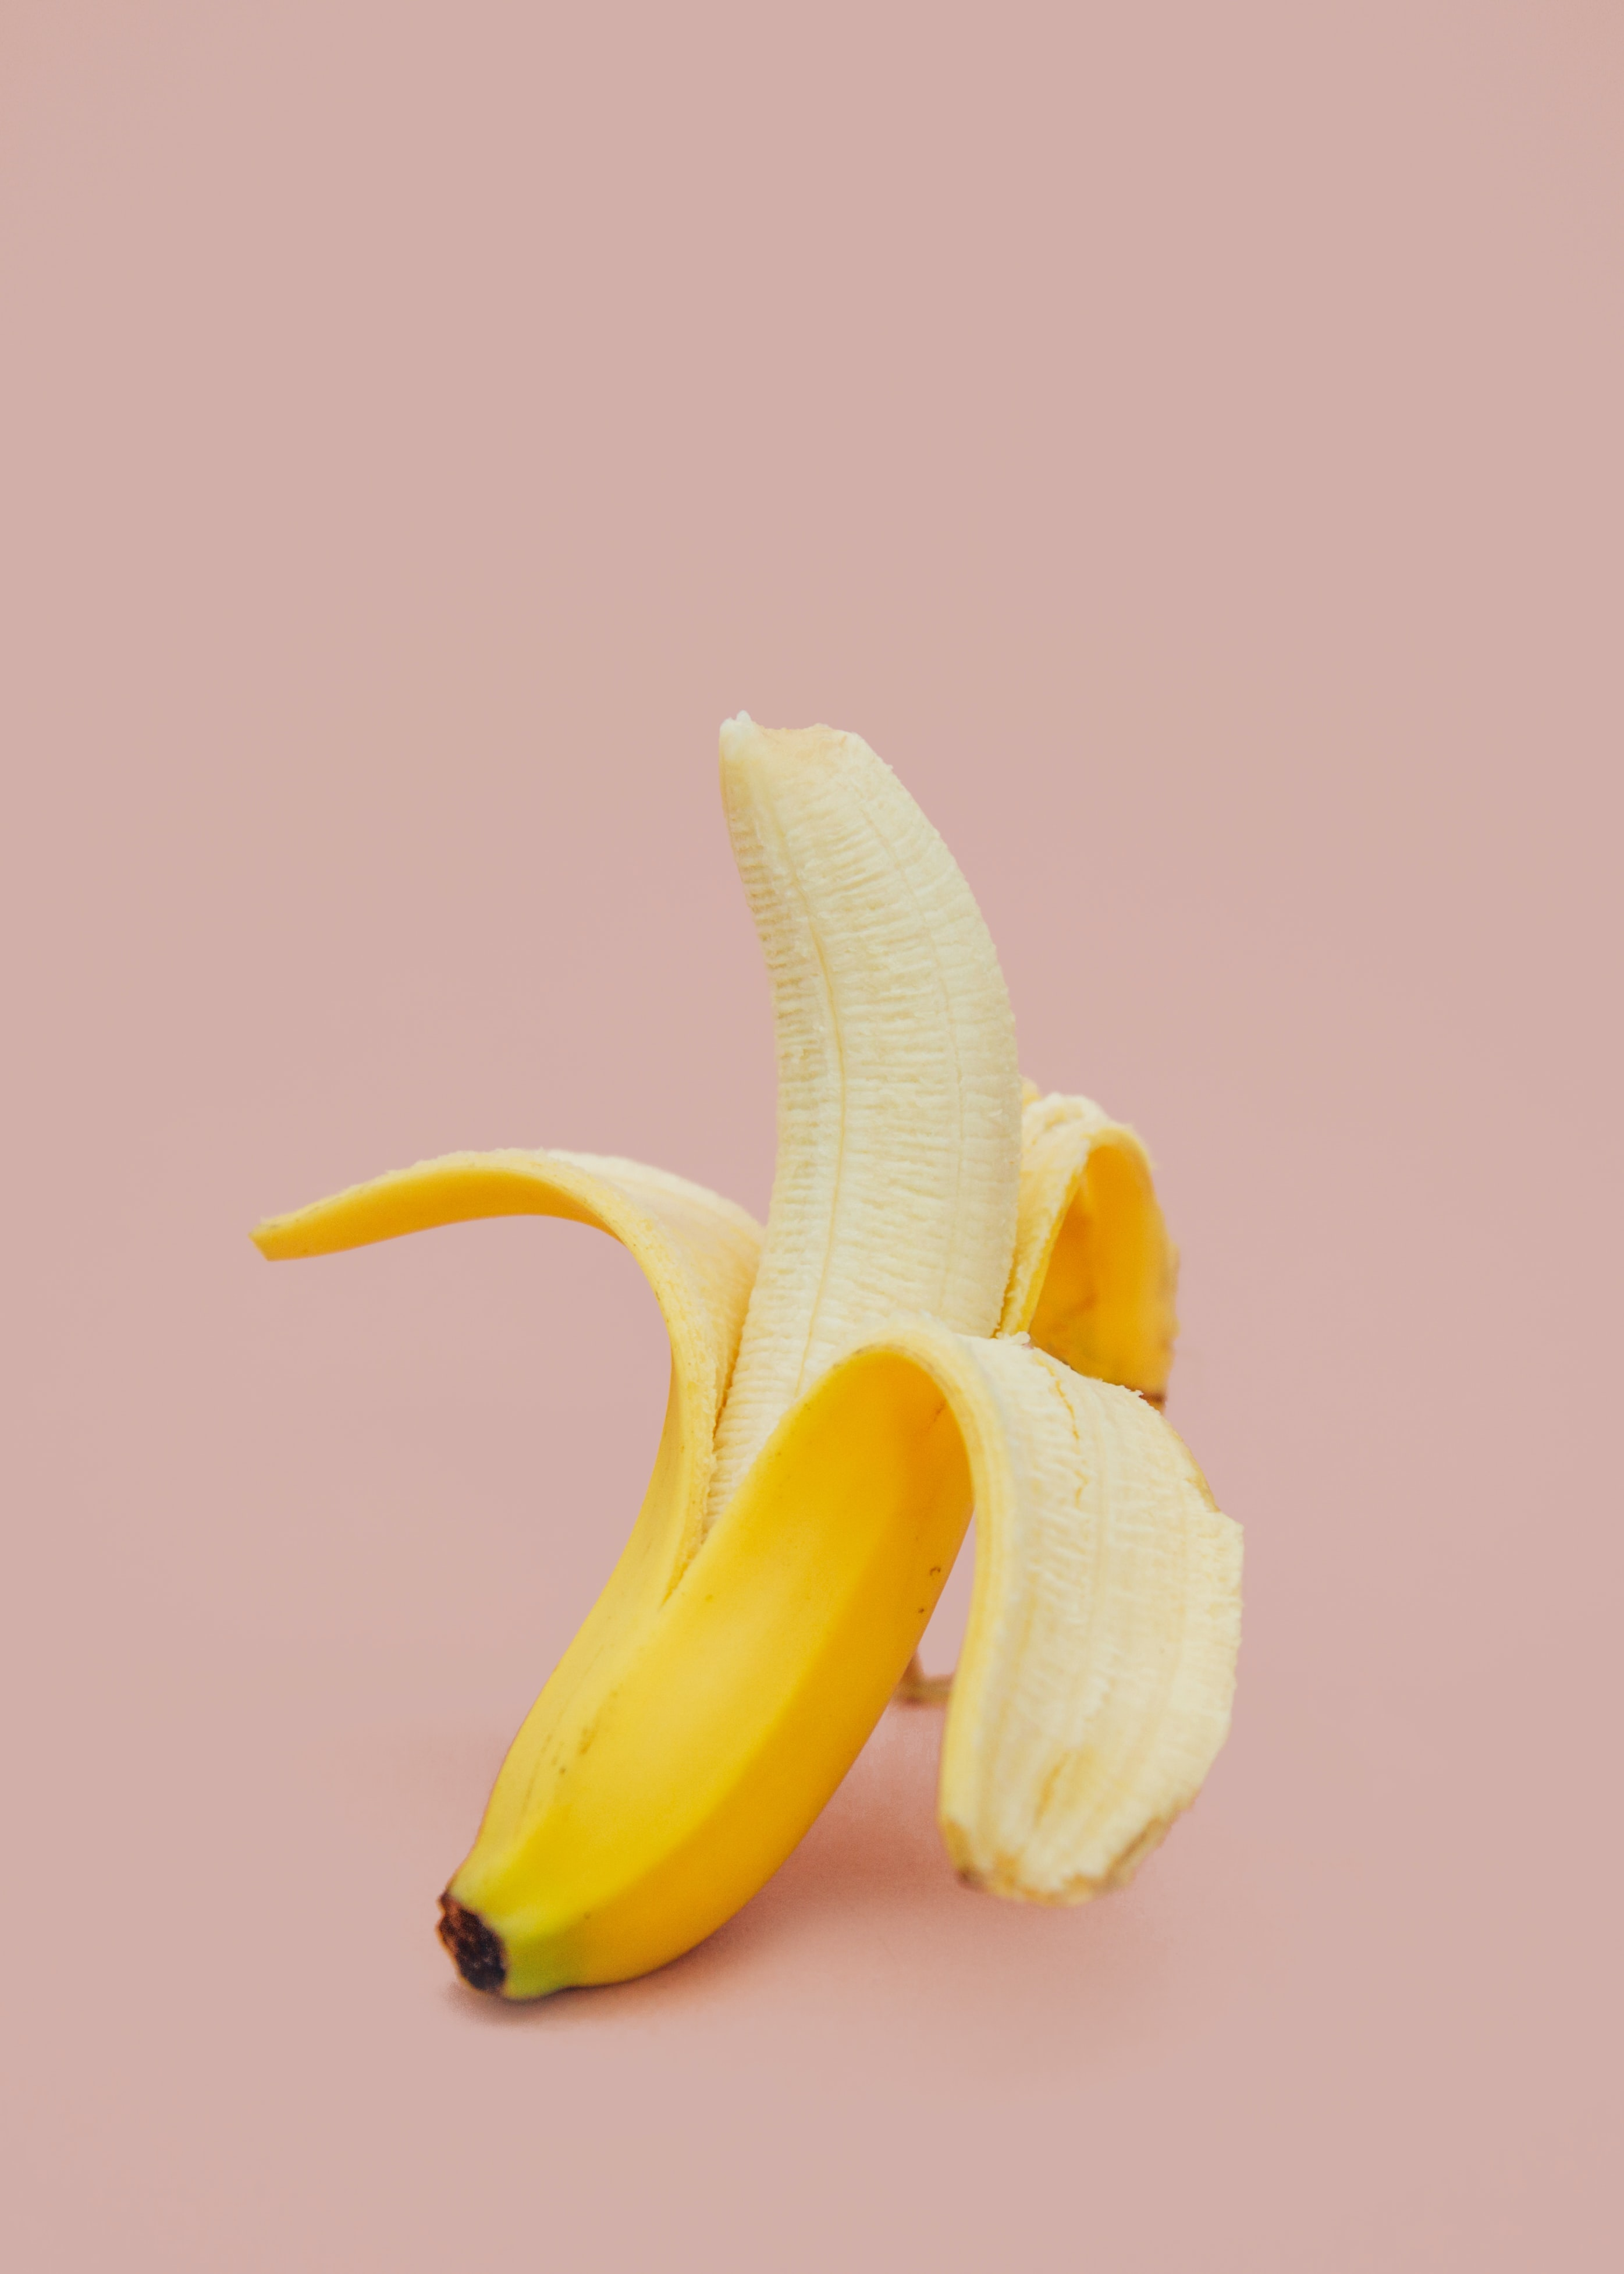 graphic regarding Banana Printable named 27+ Banana Shots Down load Totally free Illustrations or photos upon Unsplash